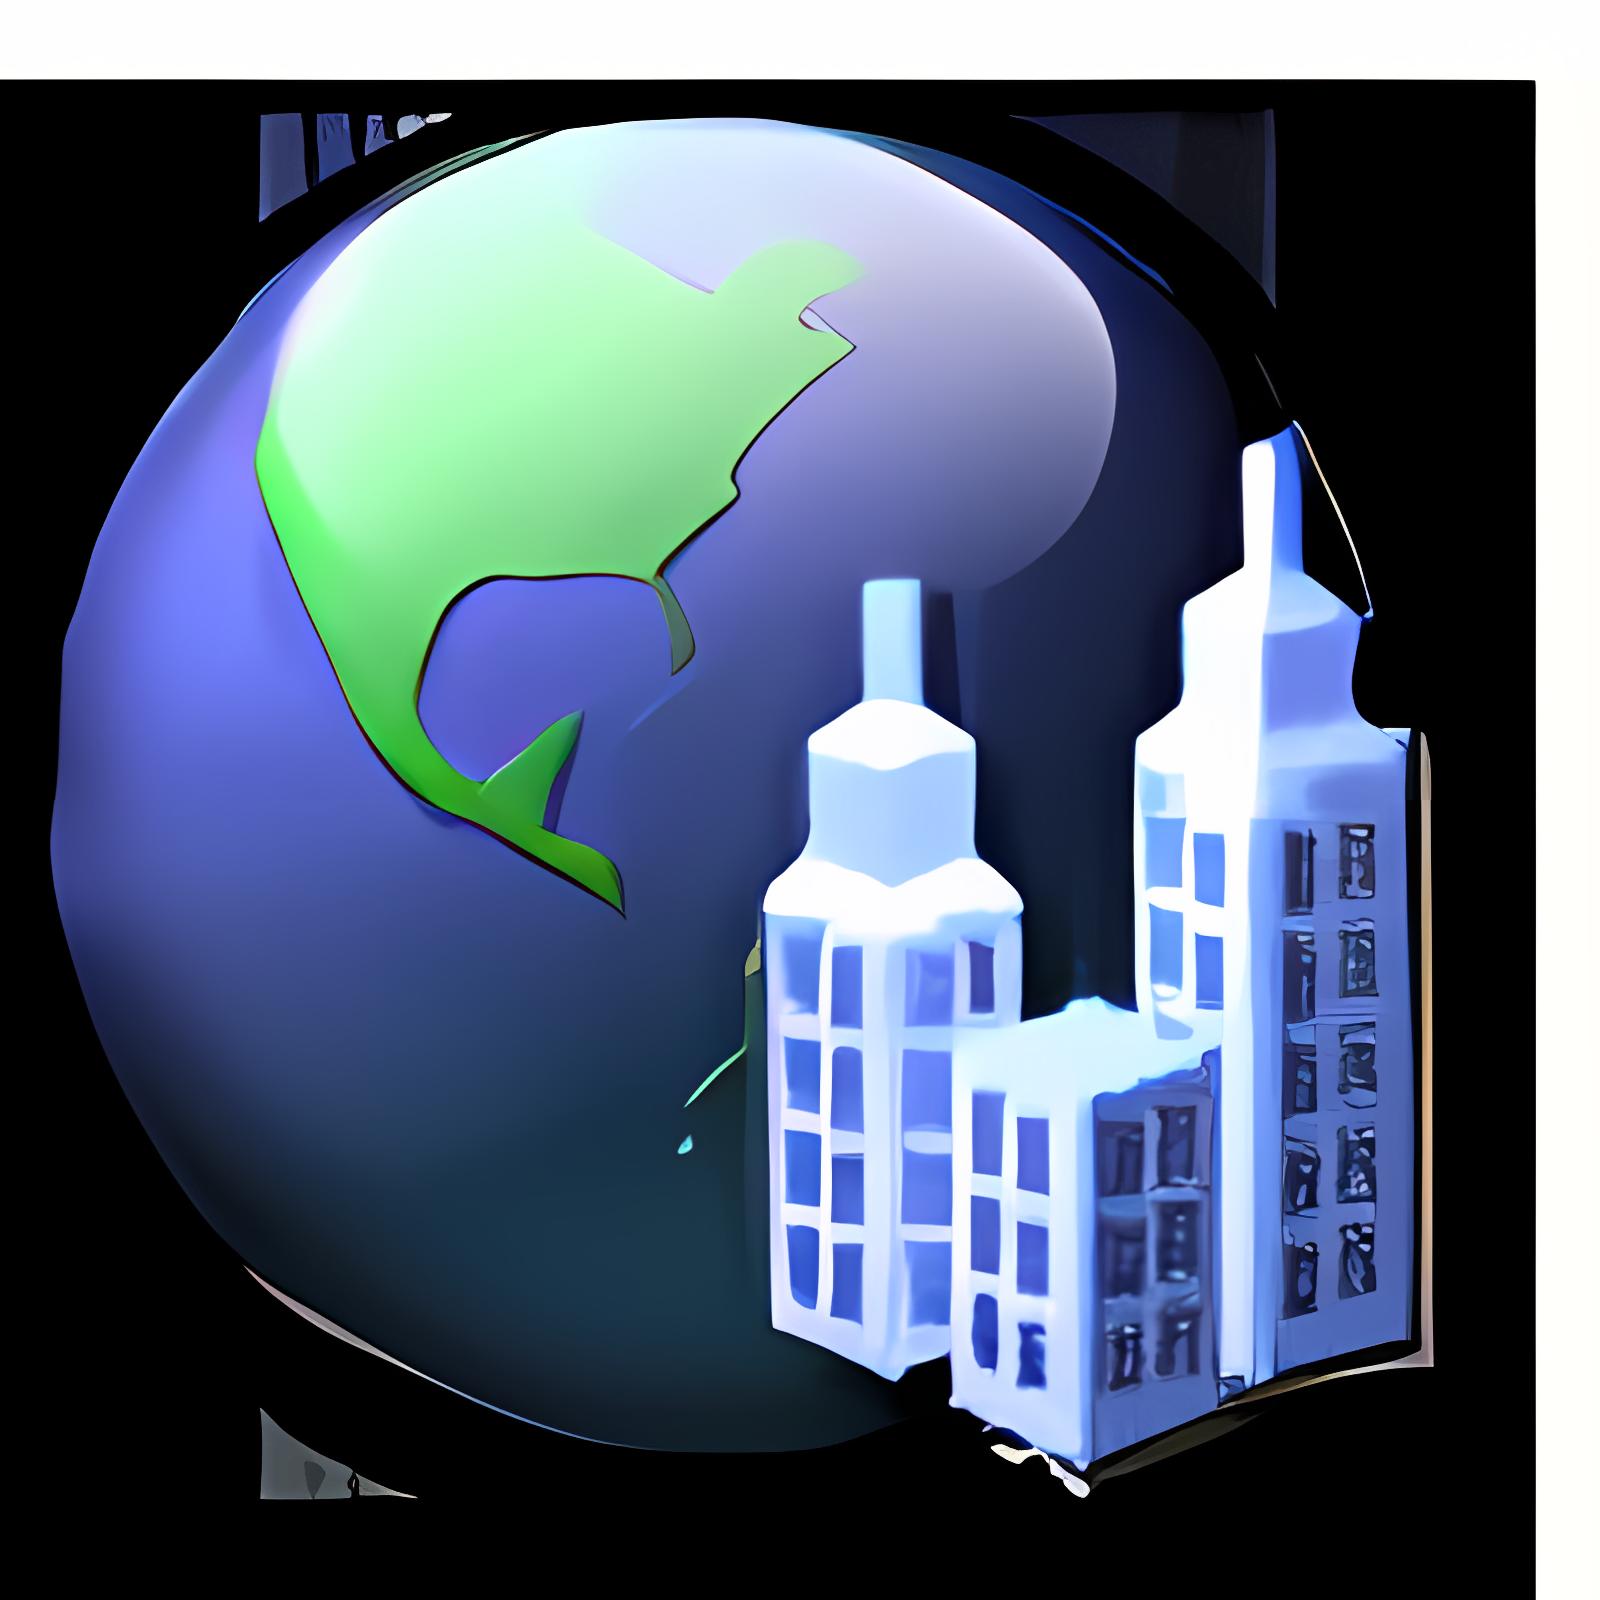 Bing Maps 3D 4.0 Beta